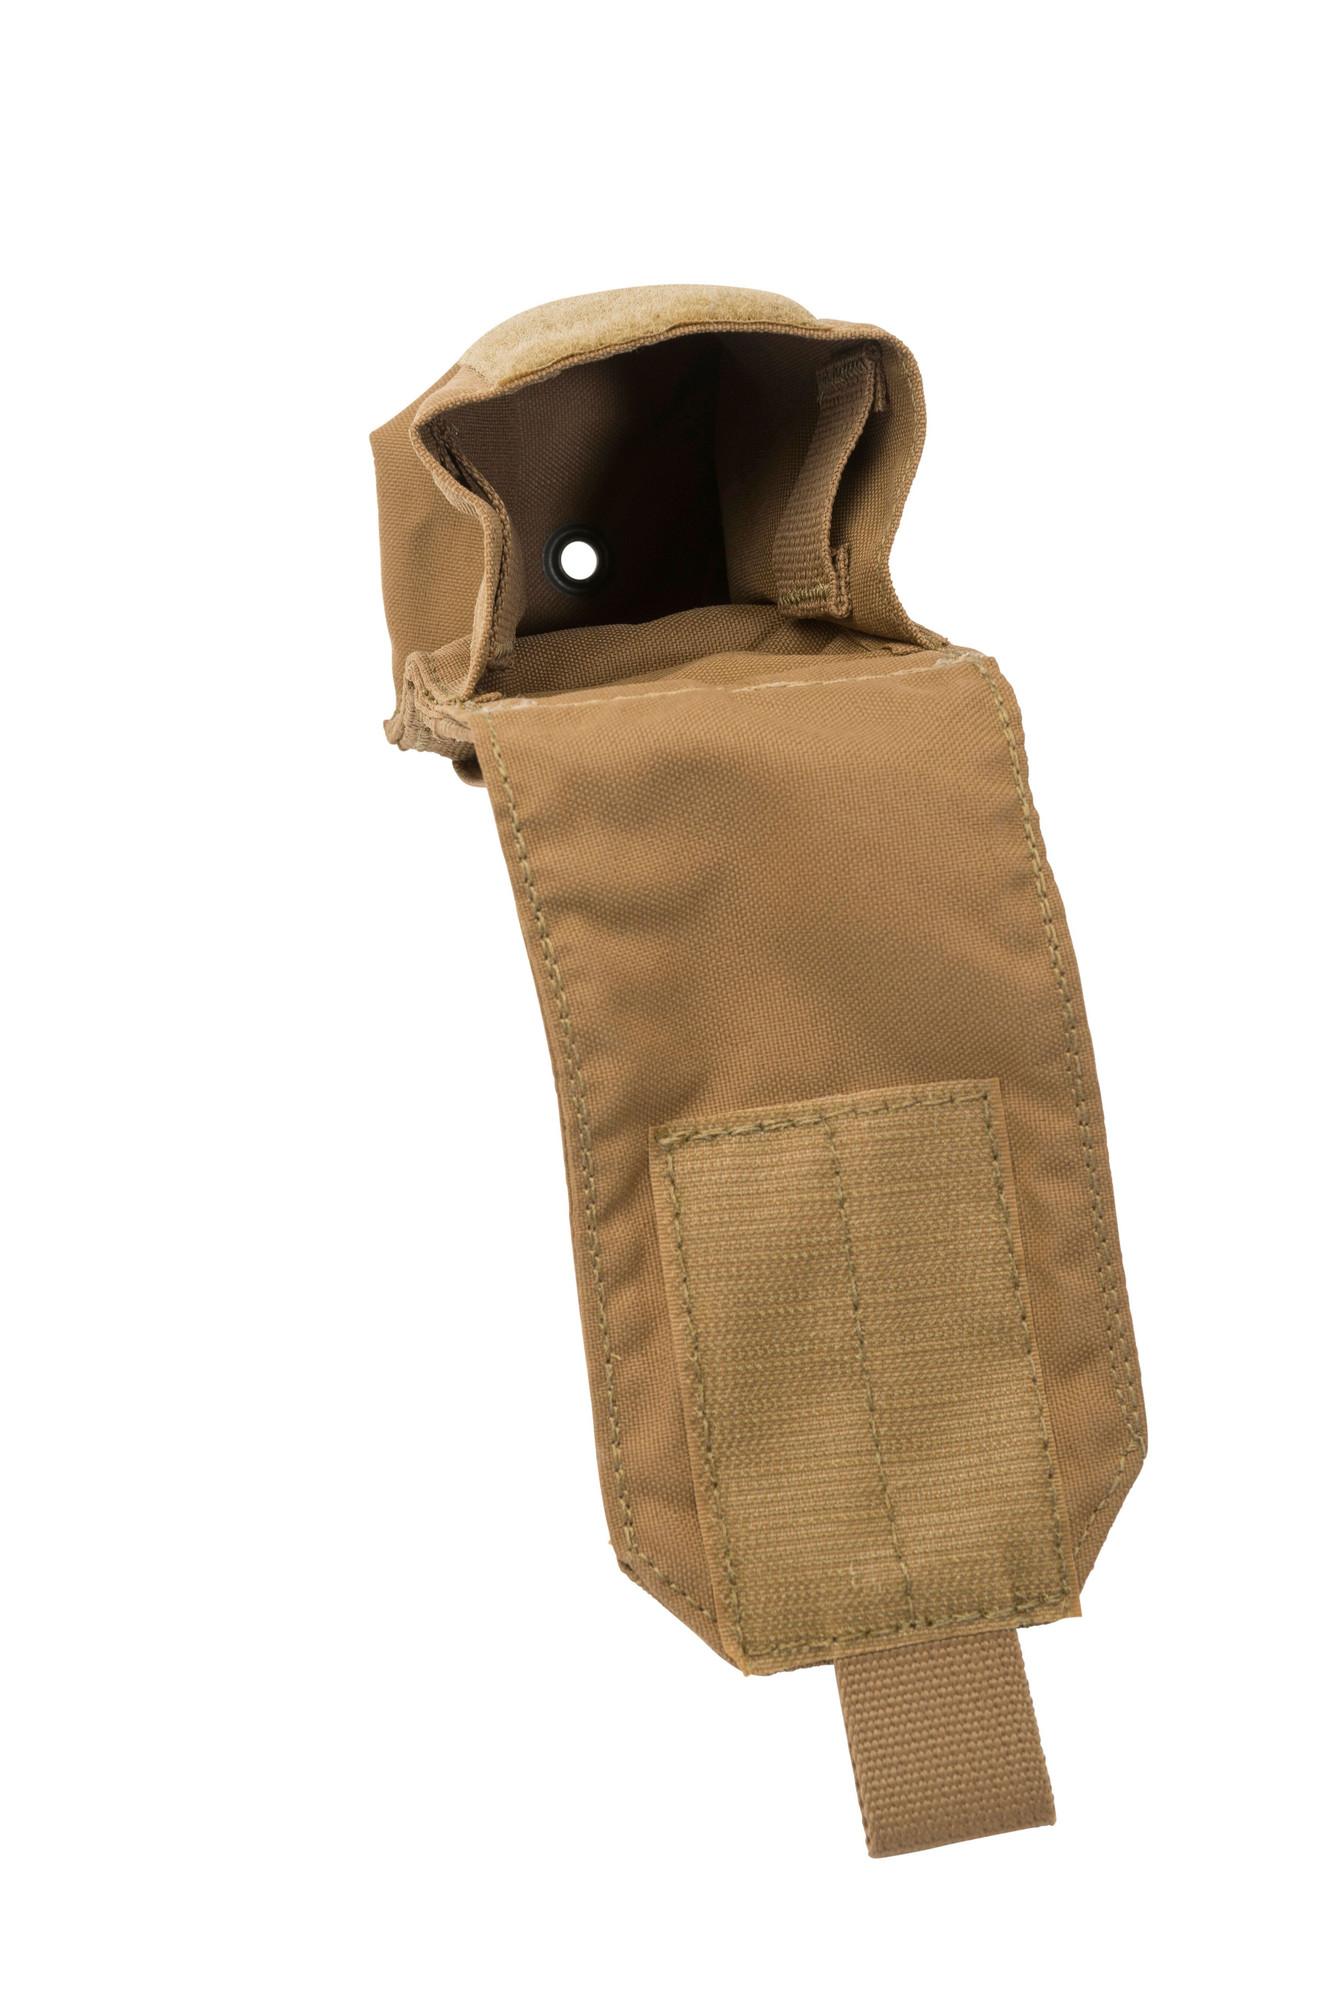 Coyote Tan MOLLE T3-SGP 1 NEW T3 Gear Single Smoke Grenade Pouch